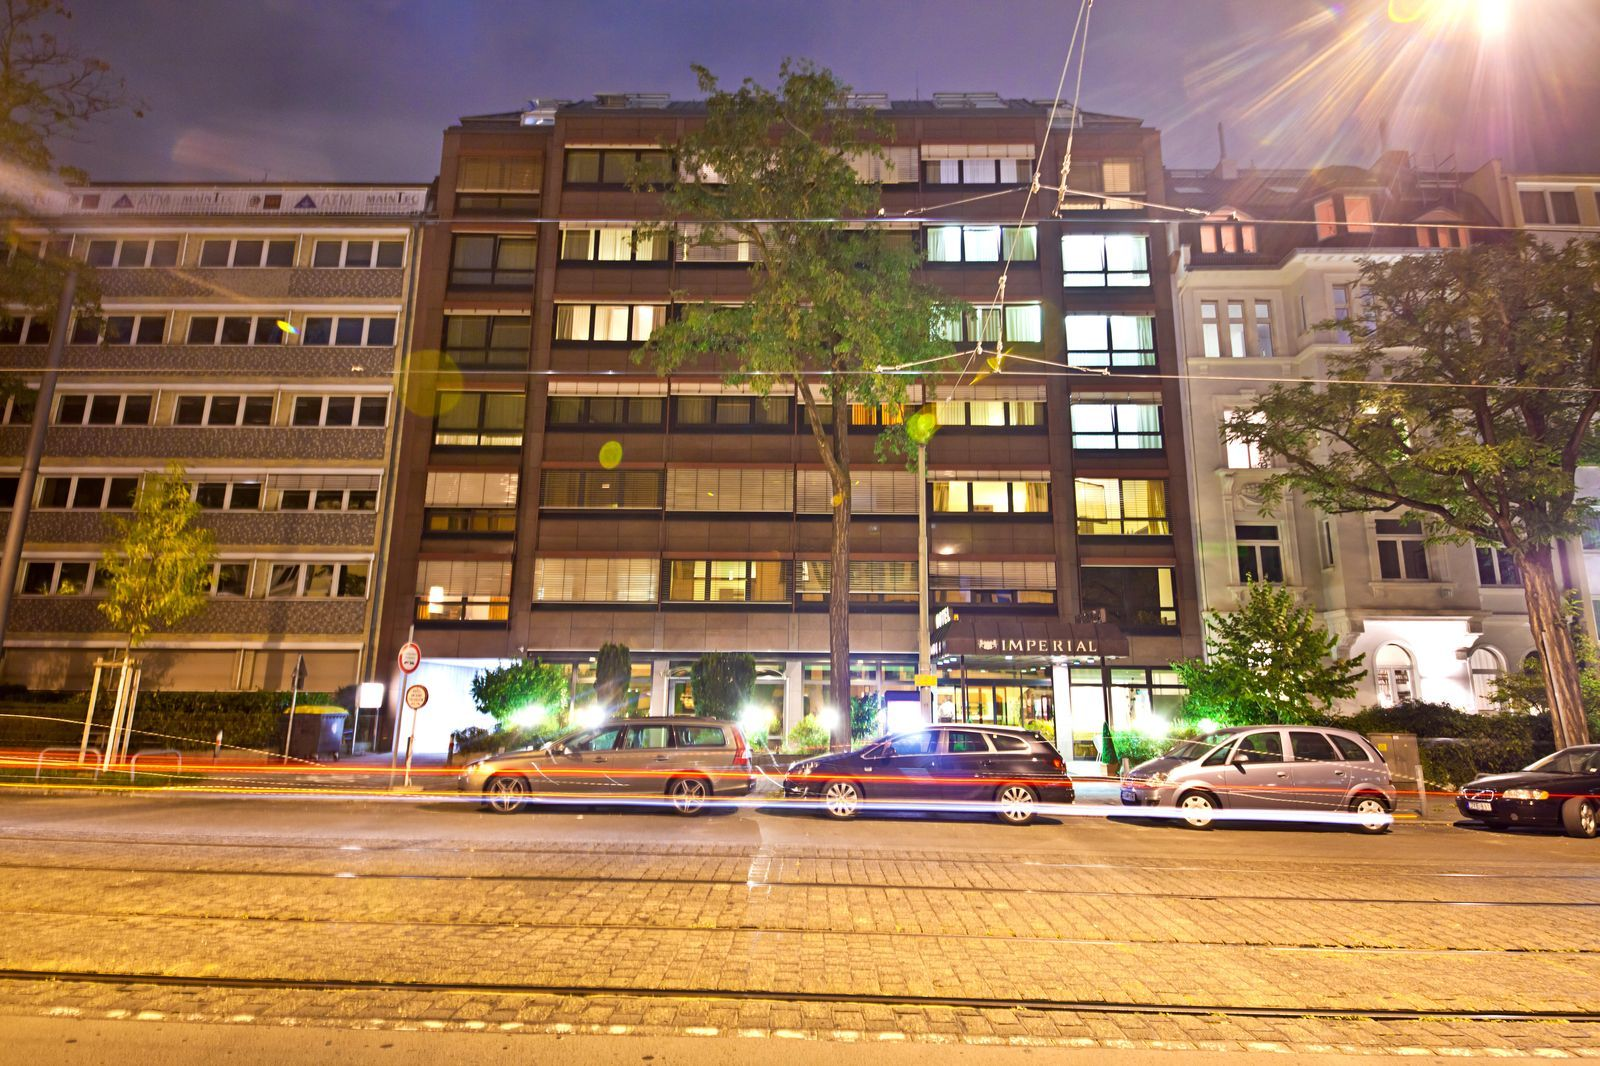 Novum Hotel Imperial Frankfurt Messe Frankfurt Germany Flyin Com